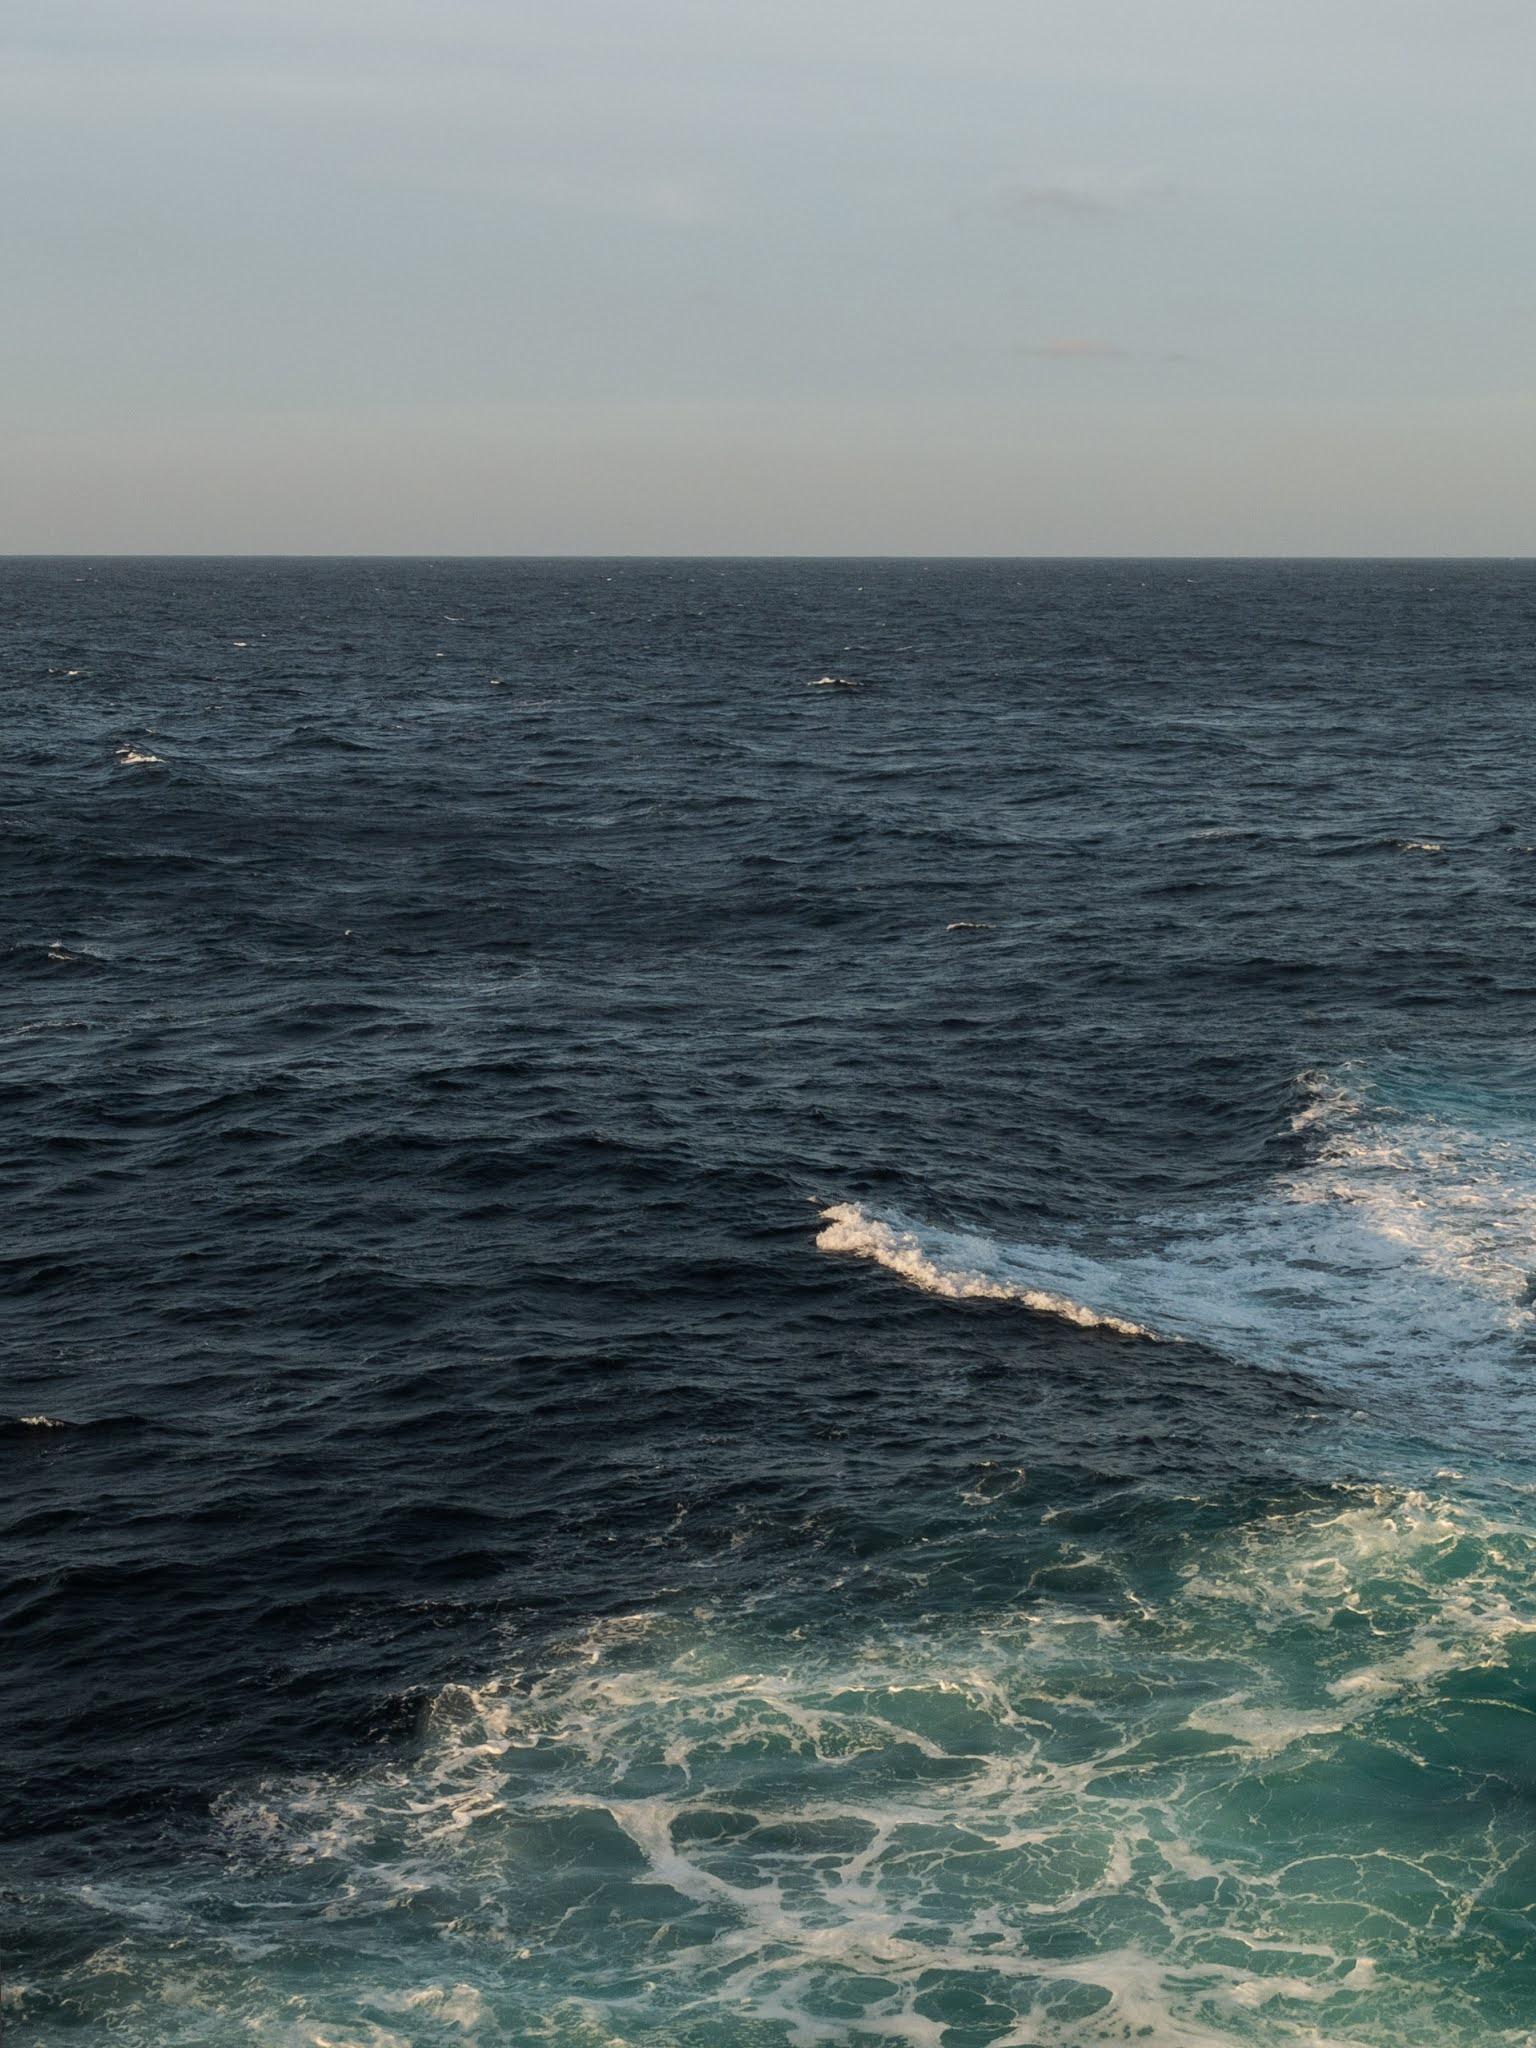 Sunlight shining on the North Atlantic ocean.